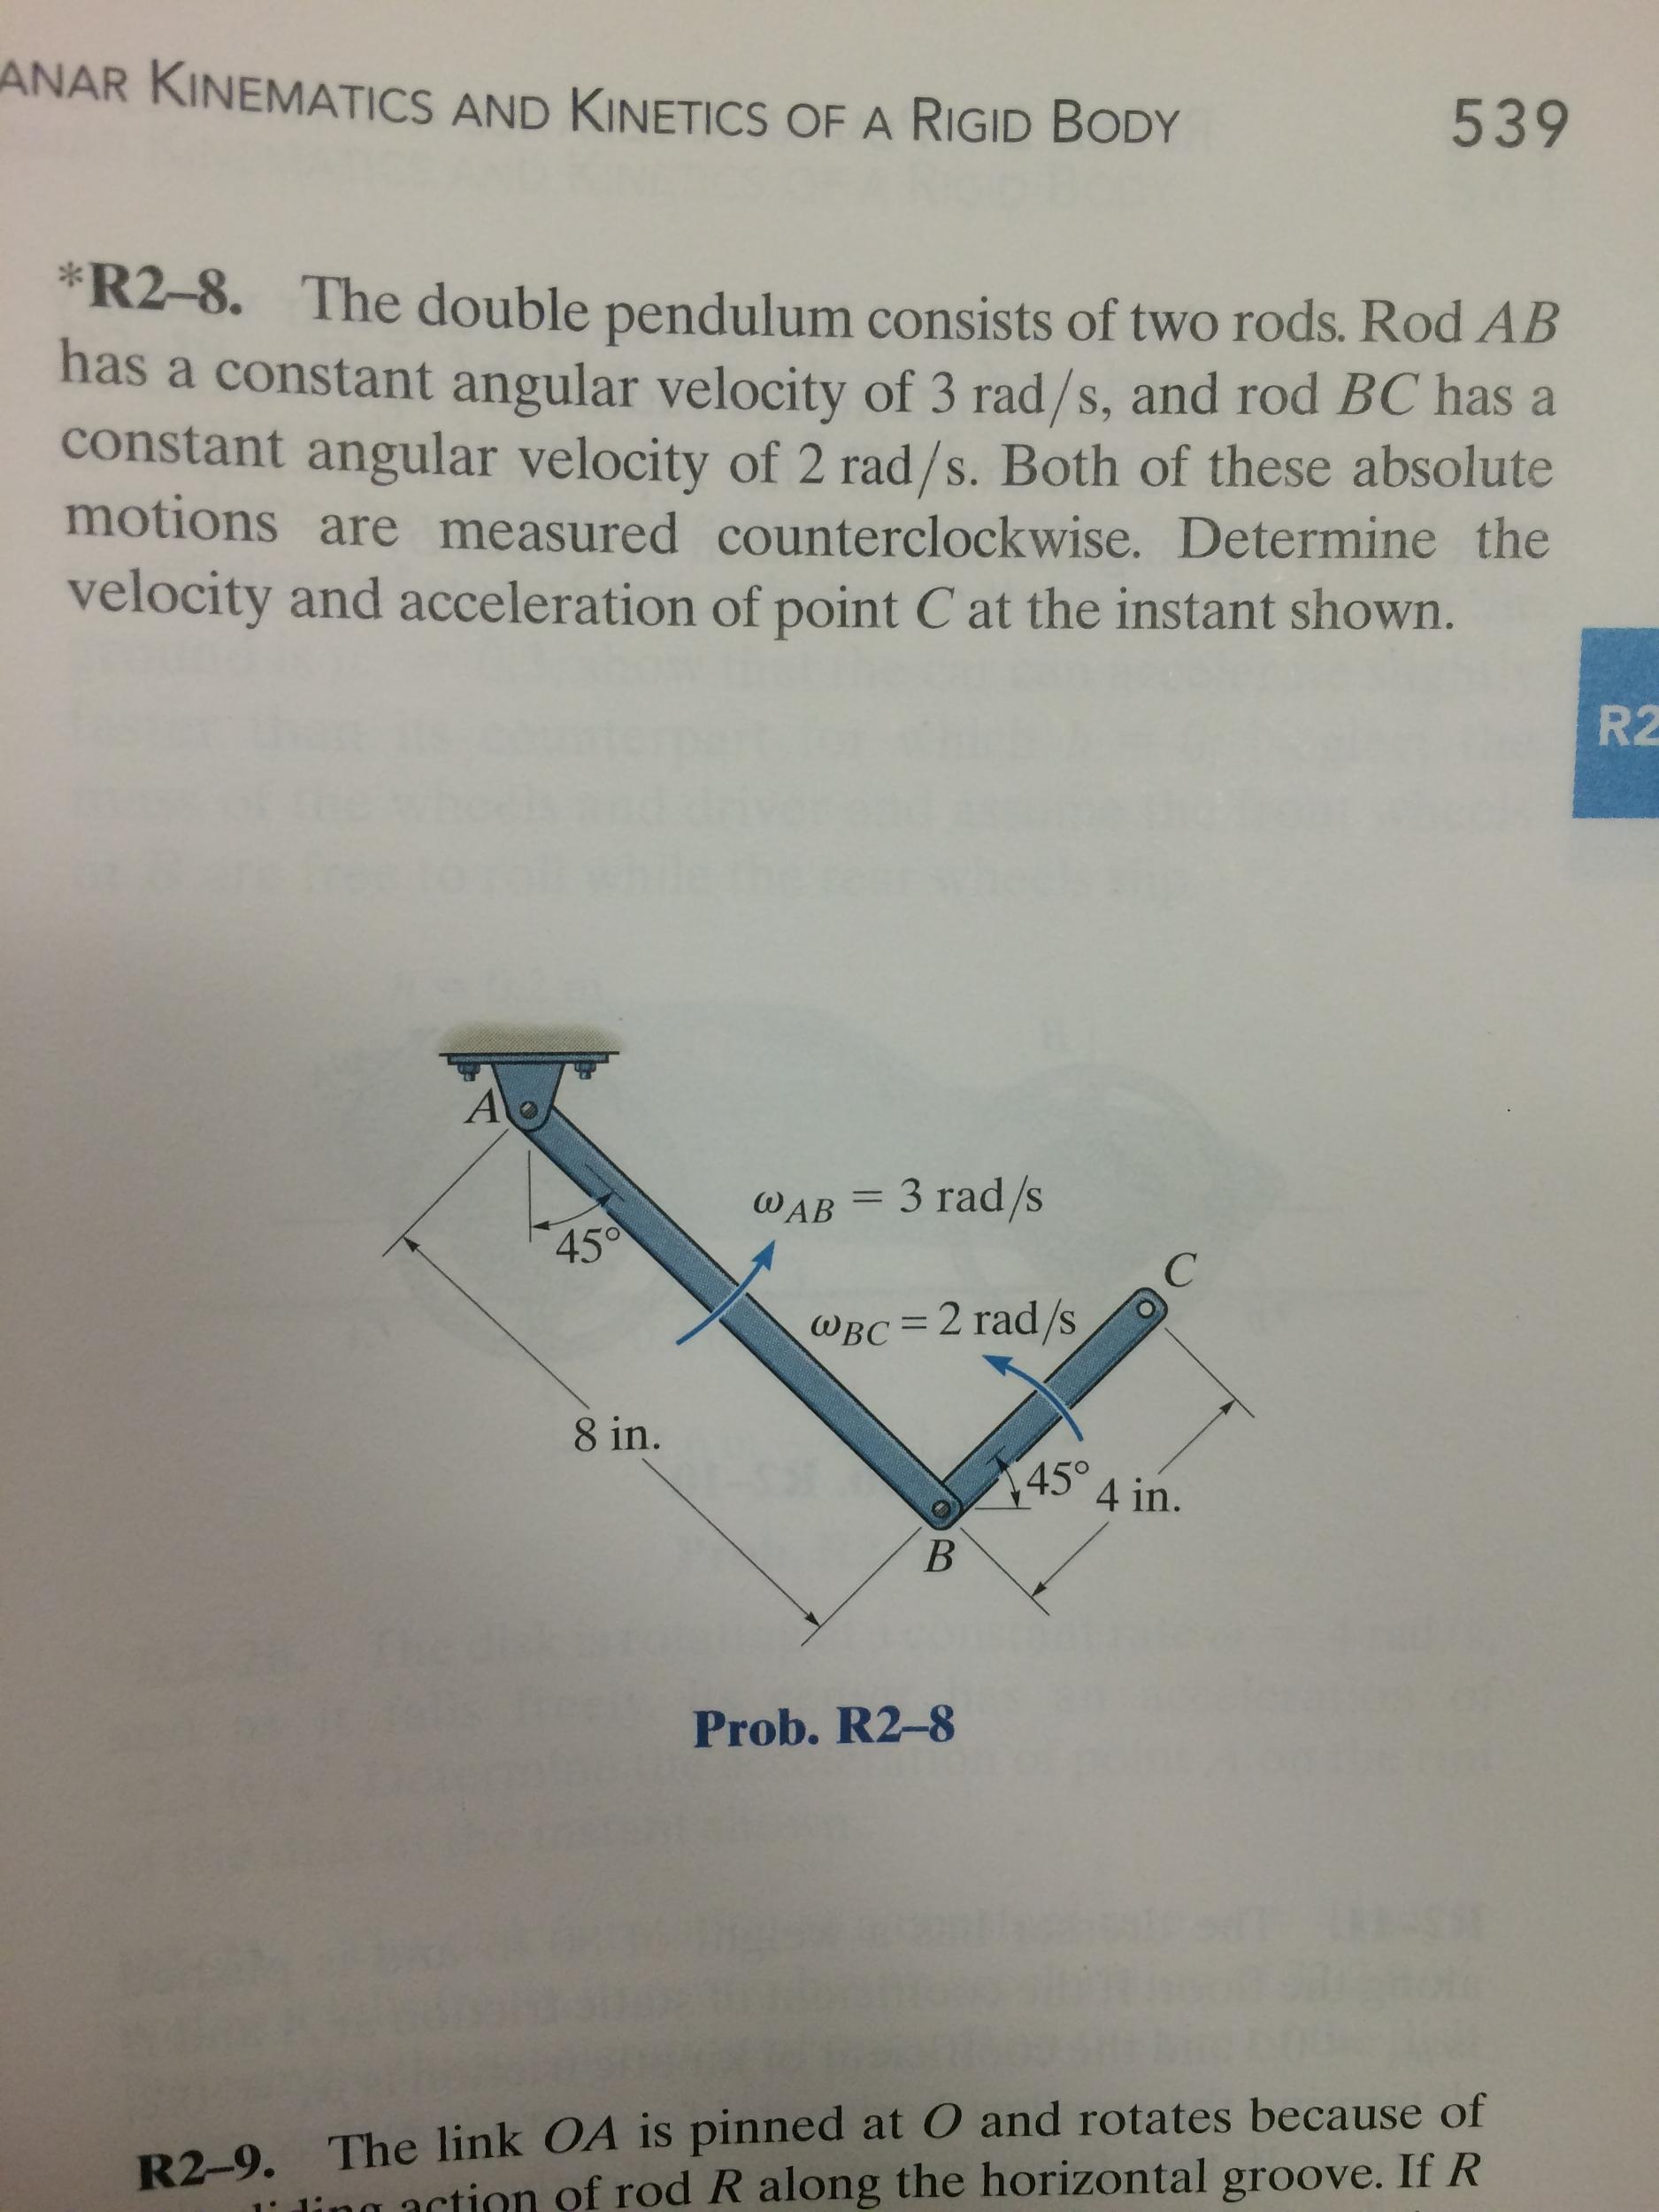 2 kinematics of a rigid body